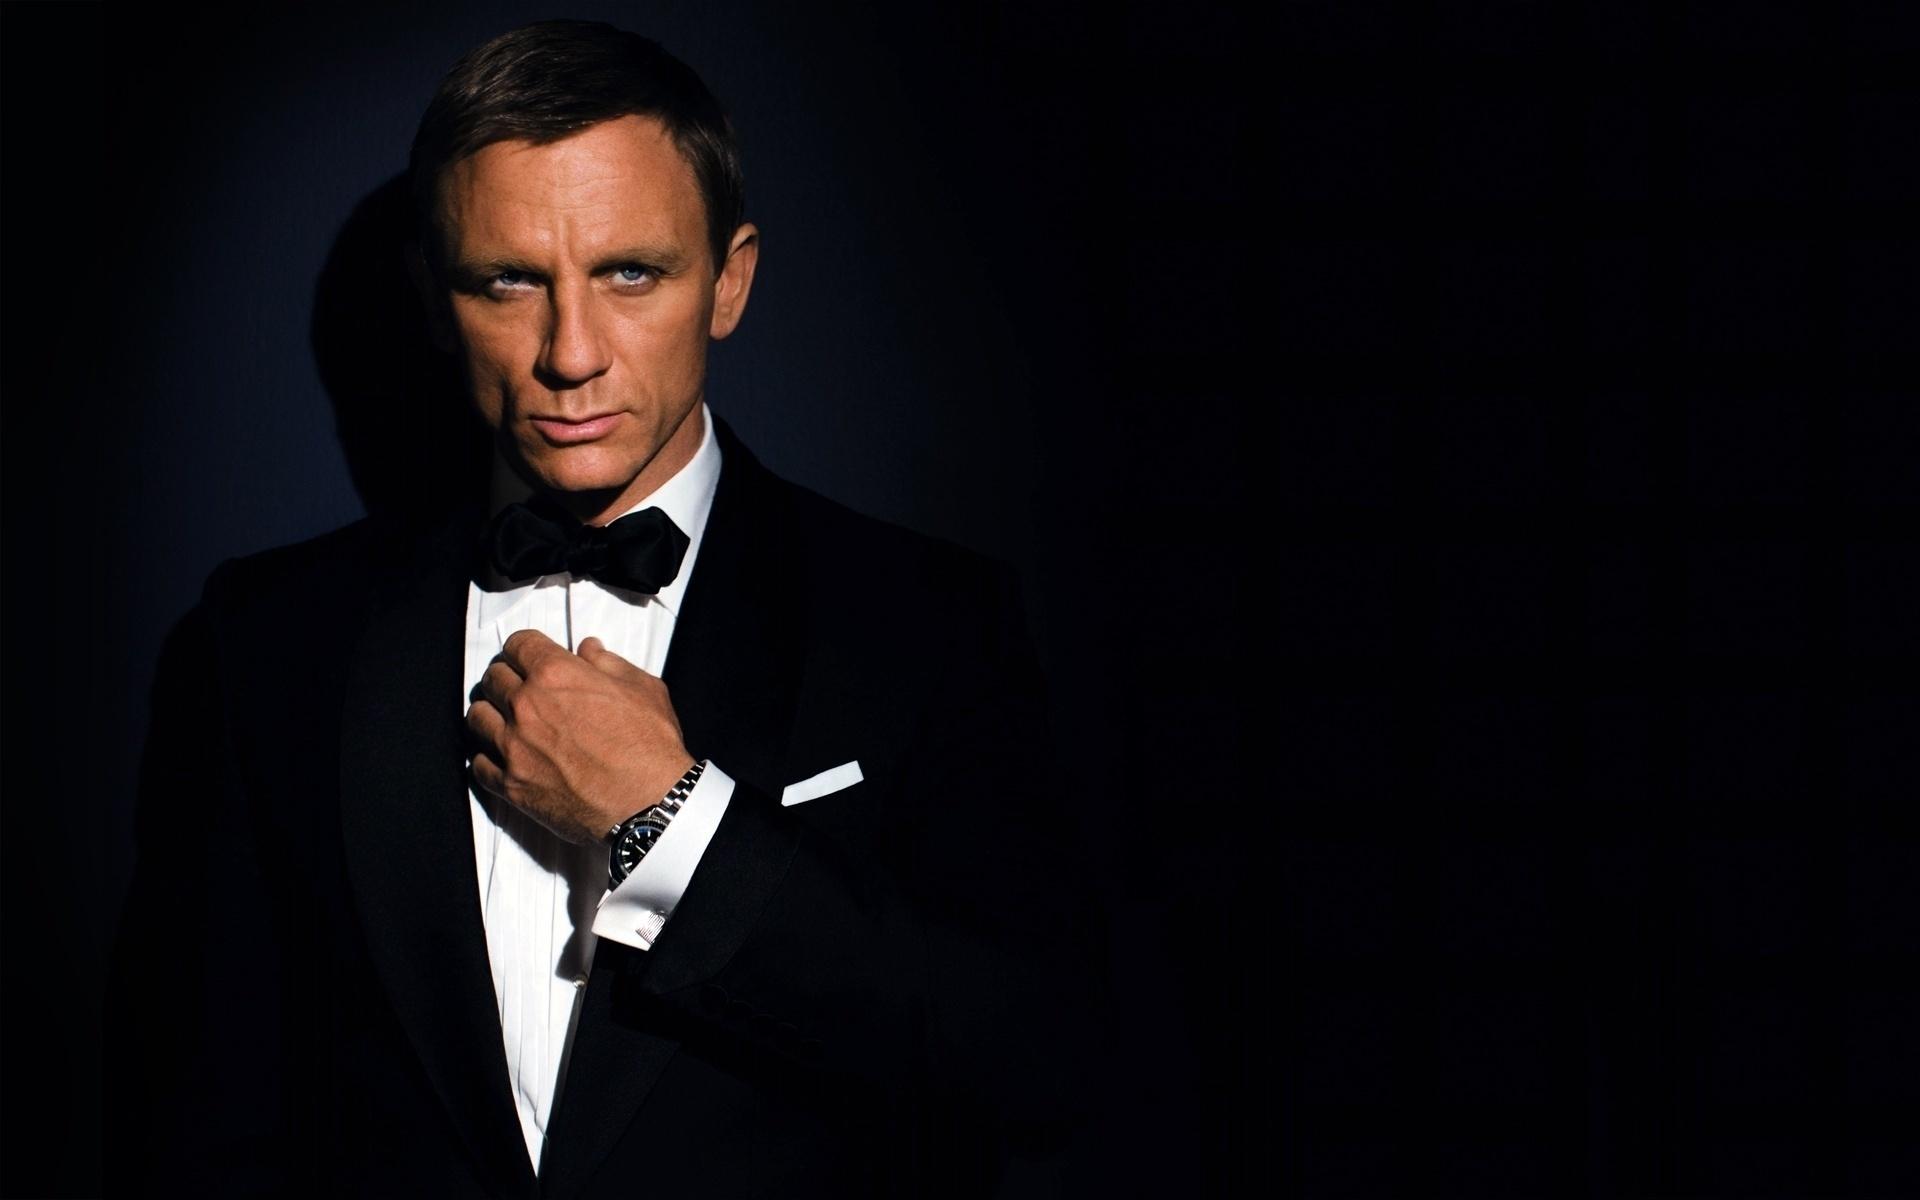 40979 download wallpaper People, Actors, Men, Daniel Craig screensavers and pictures for free